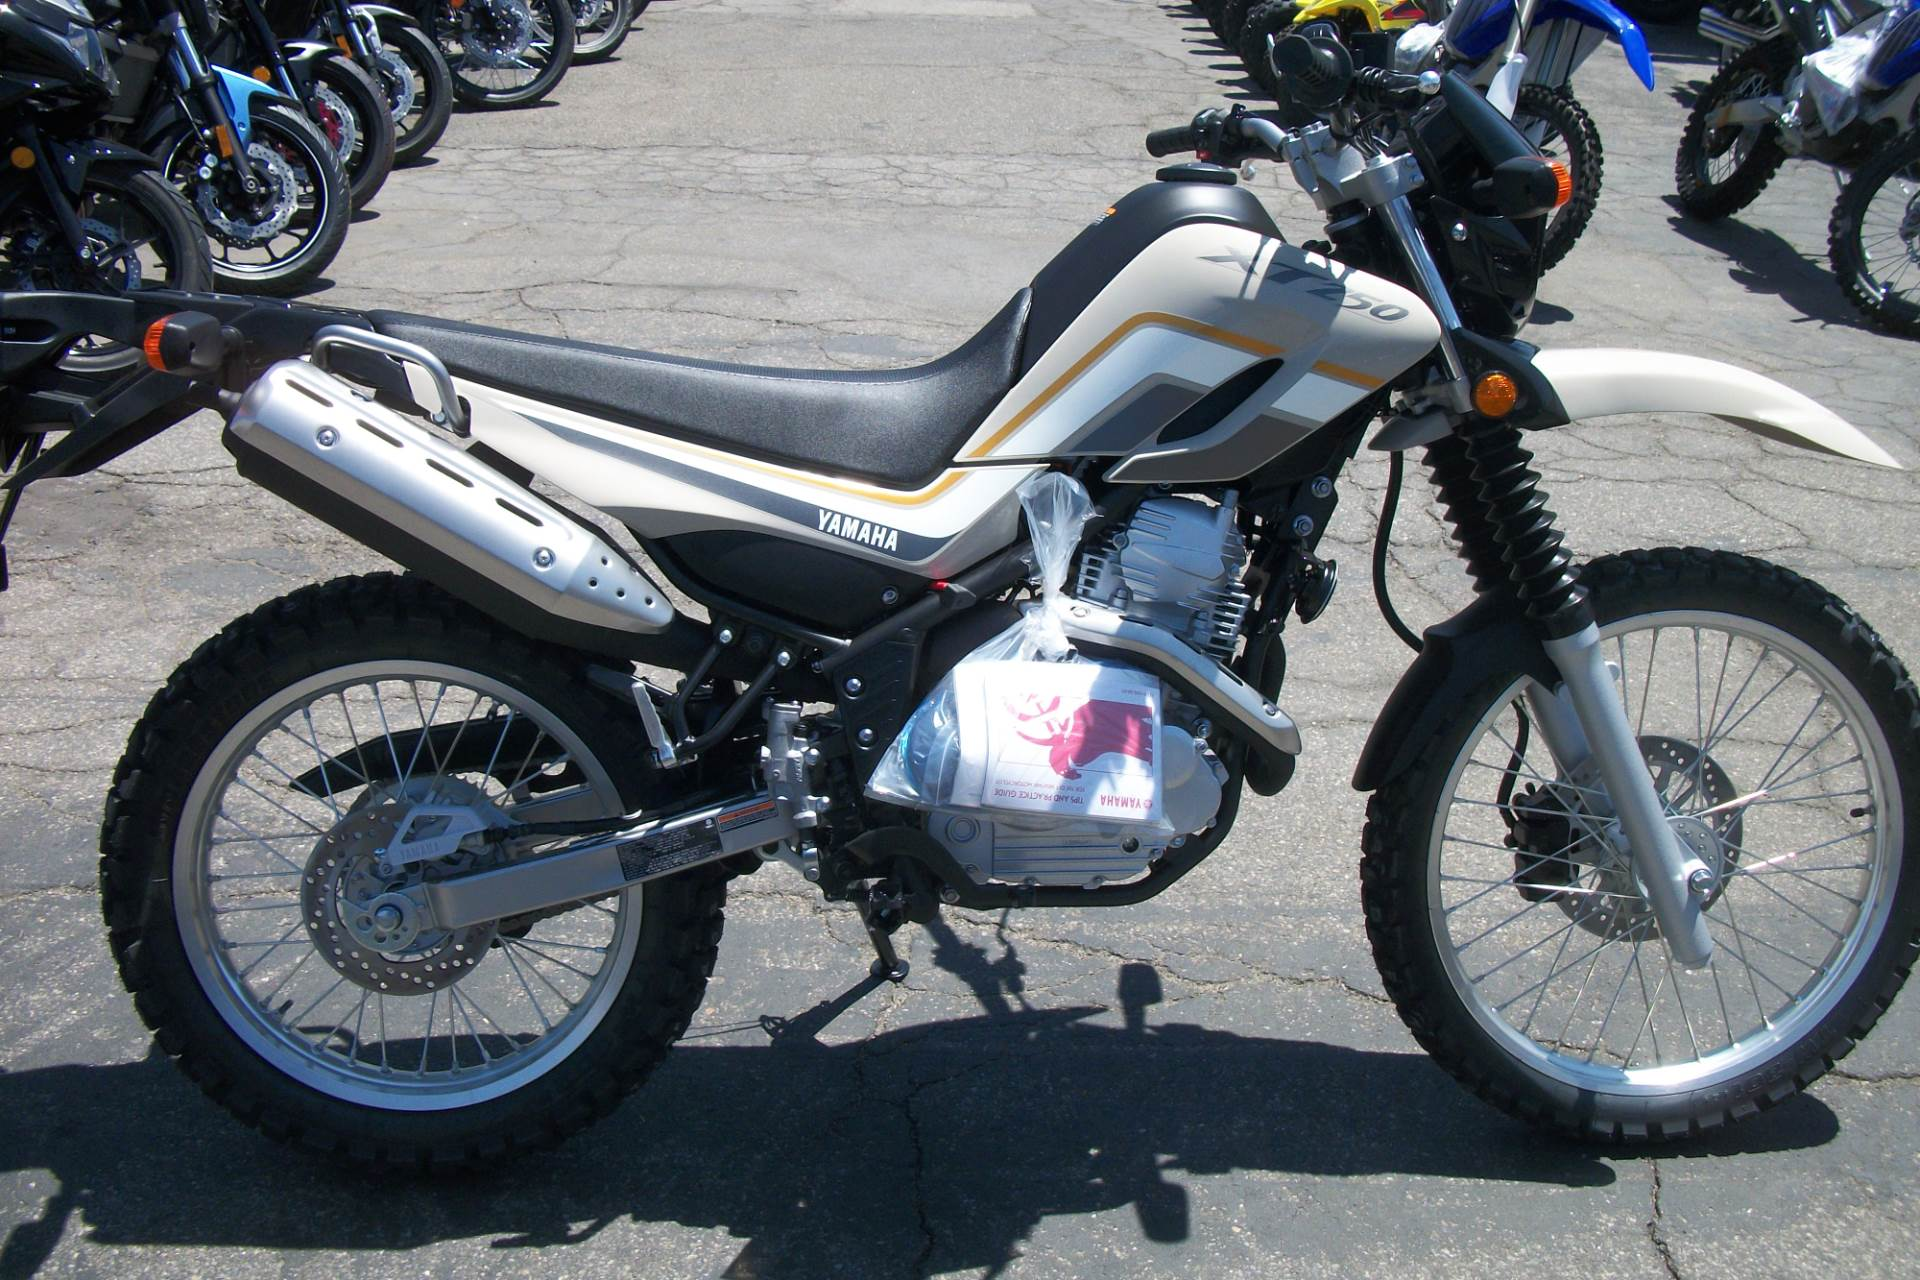 New 2018 Yamaha XT250 Motorcycles in Simi Valley, CA